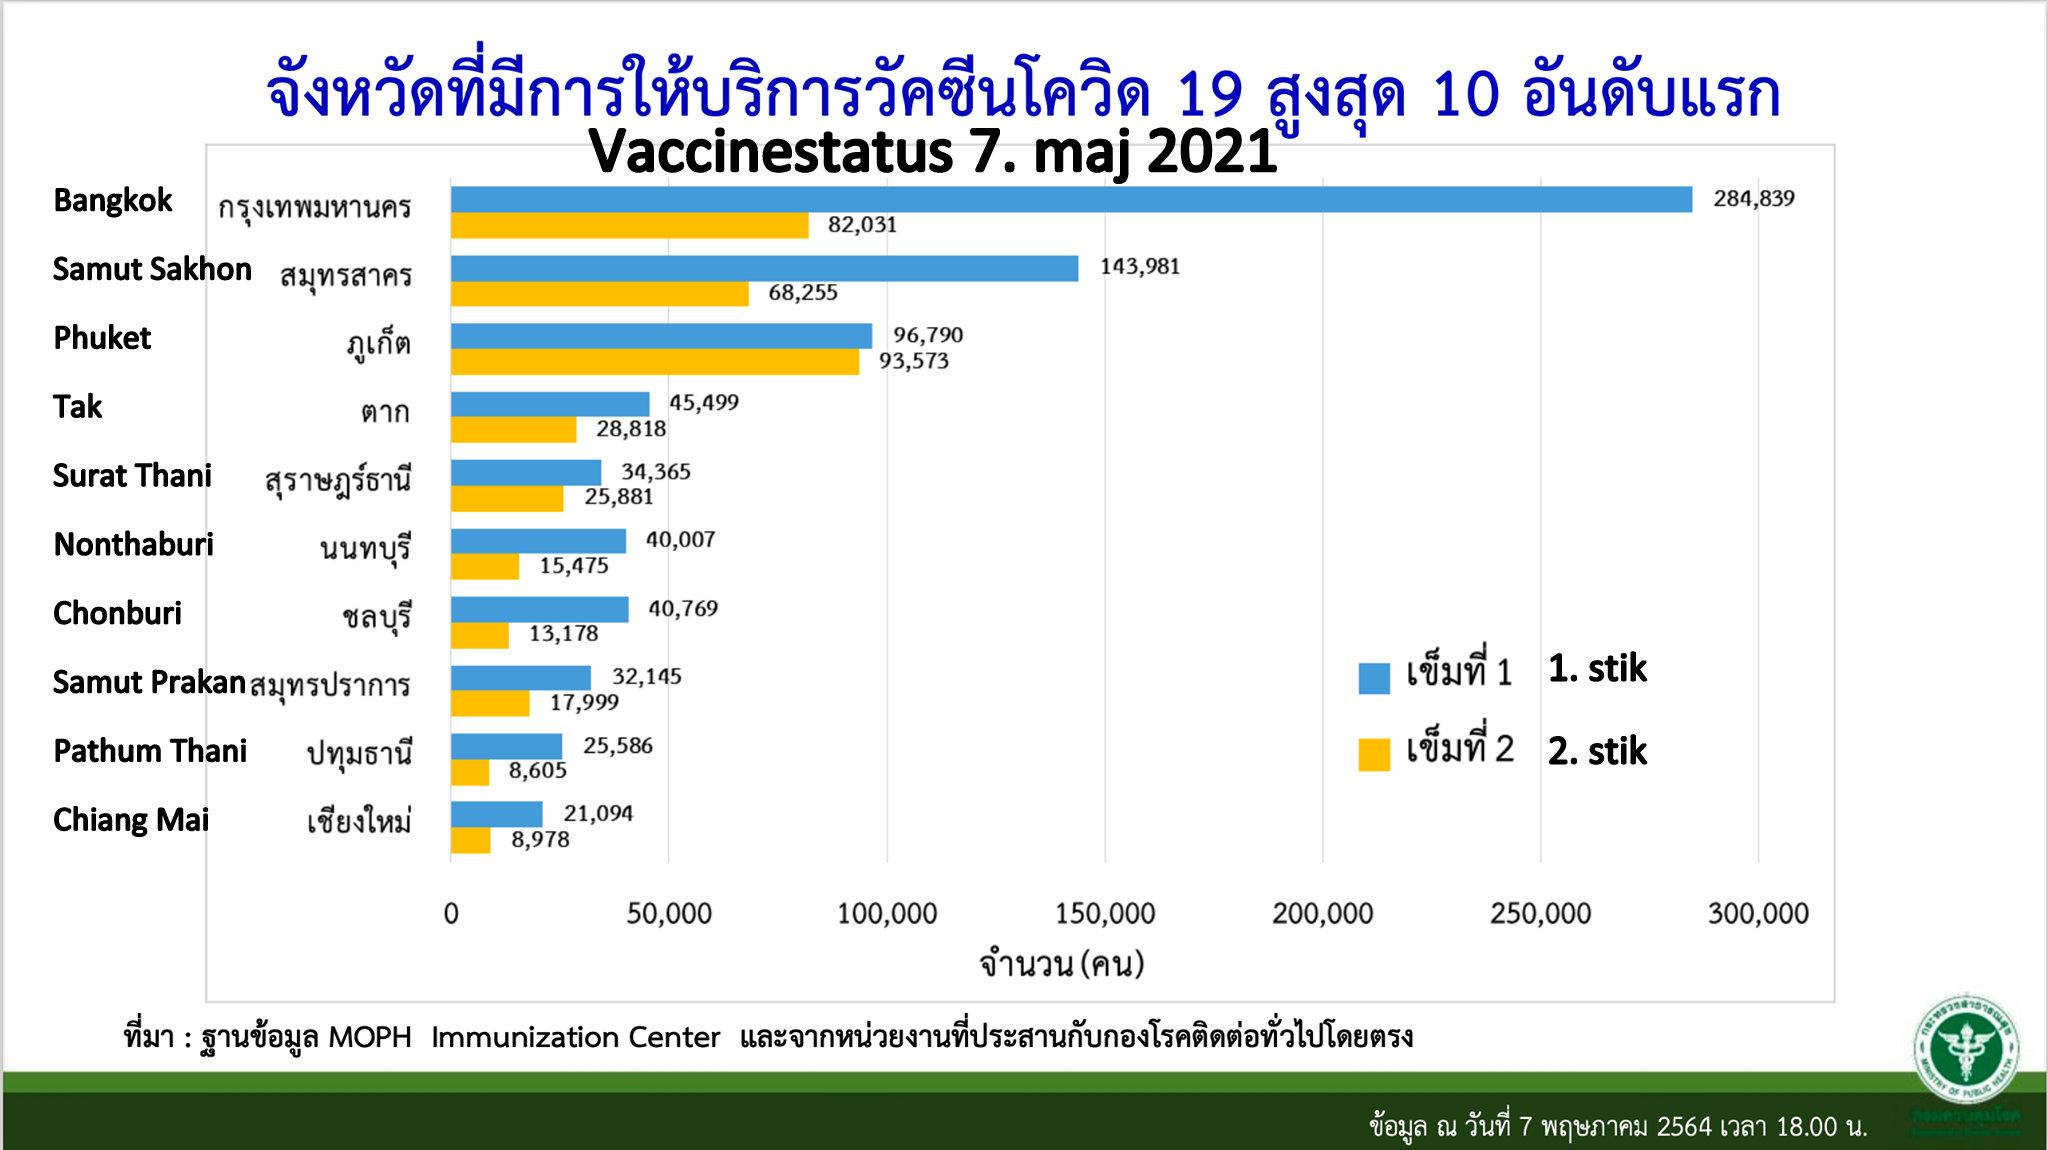 www.thaiguide.dk/images/forum/covid19/vaccinationer%20provinser%2008-05-21%20r.jpg